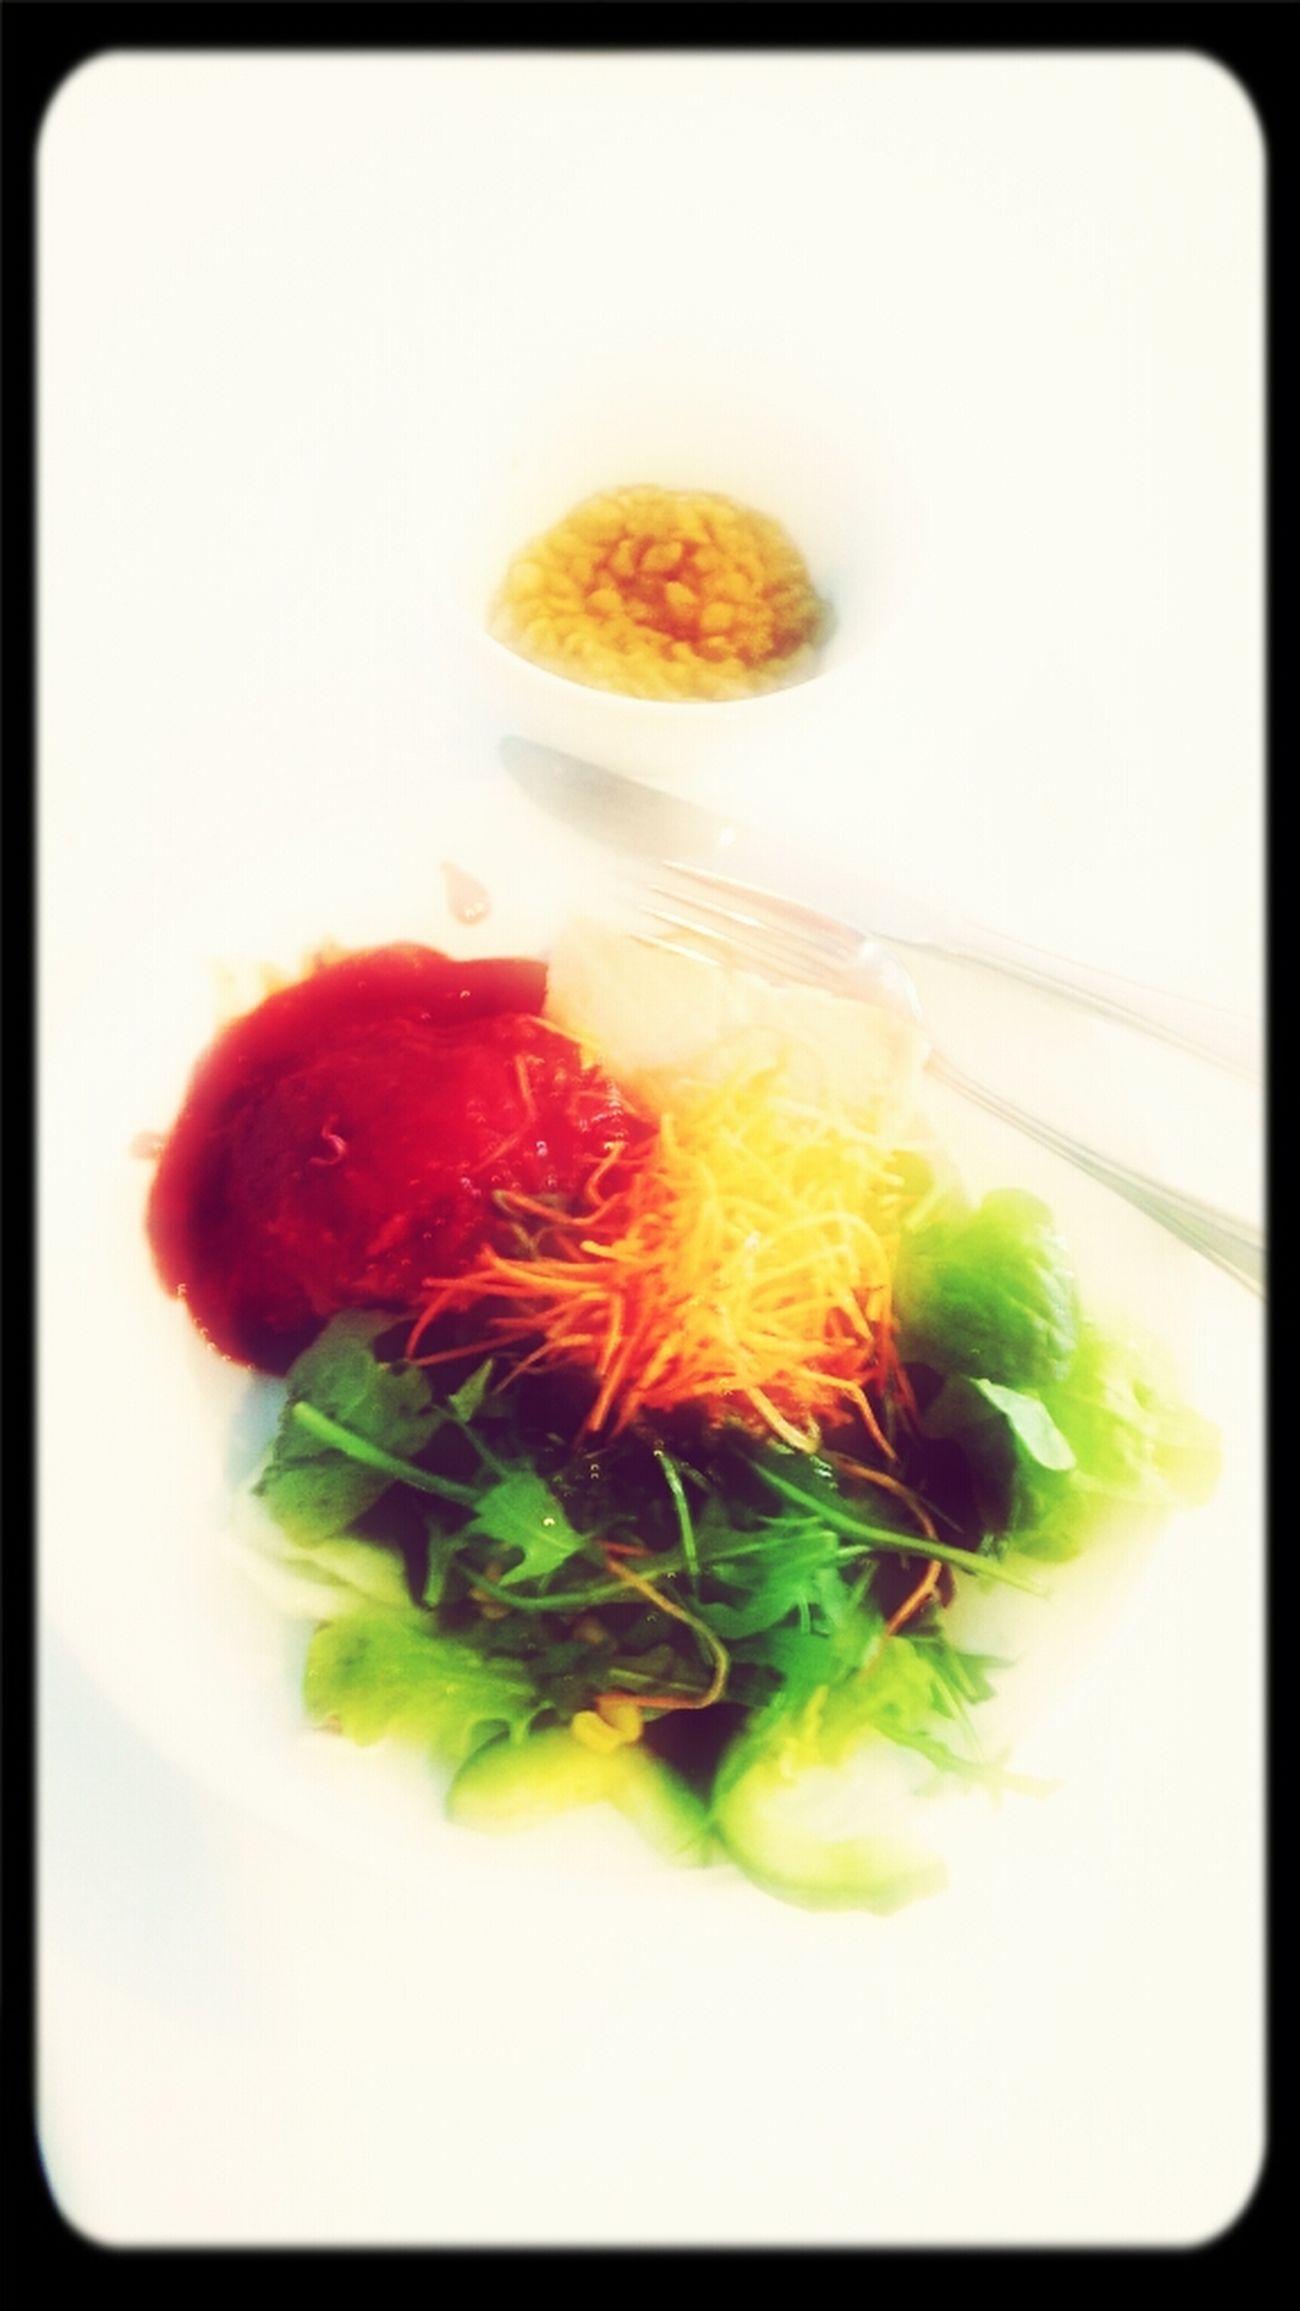 Company lunch :-P bwa ha ha ha... No carbs ;-) Seriously :-P